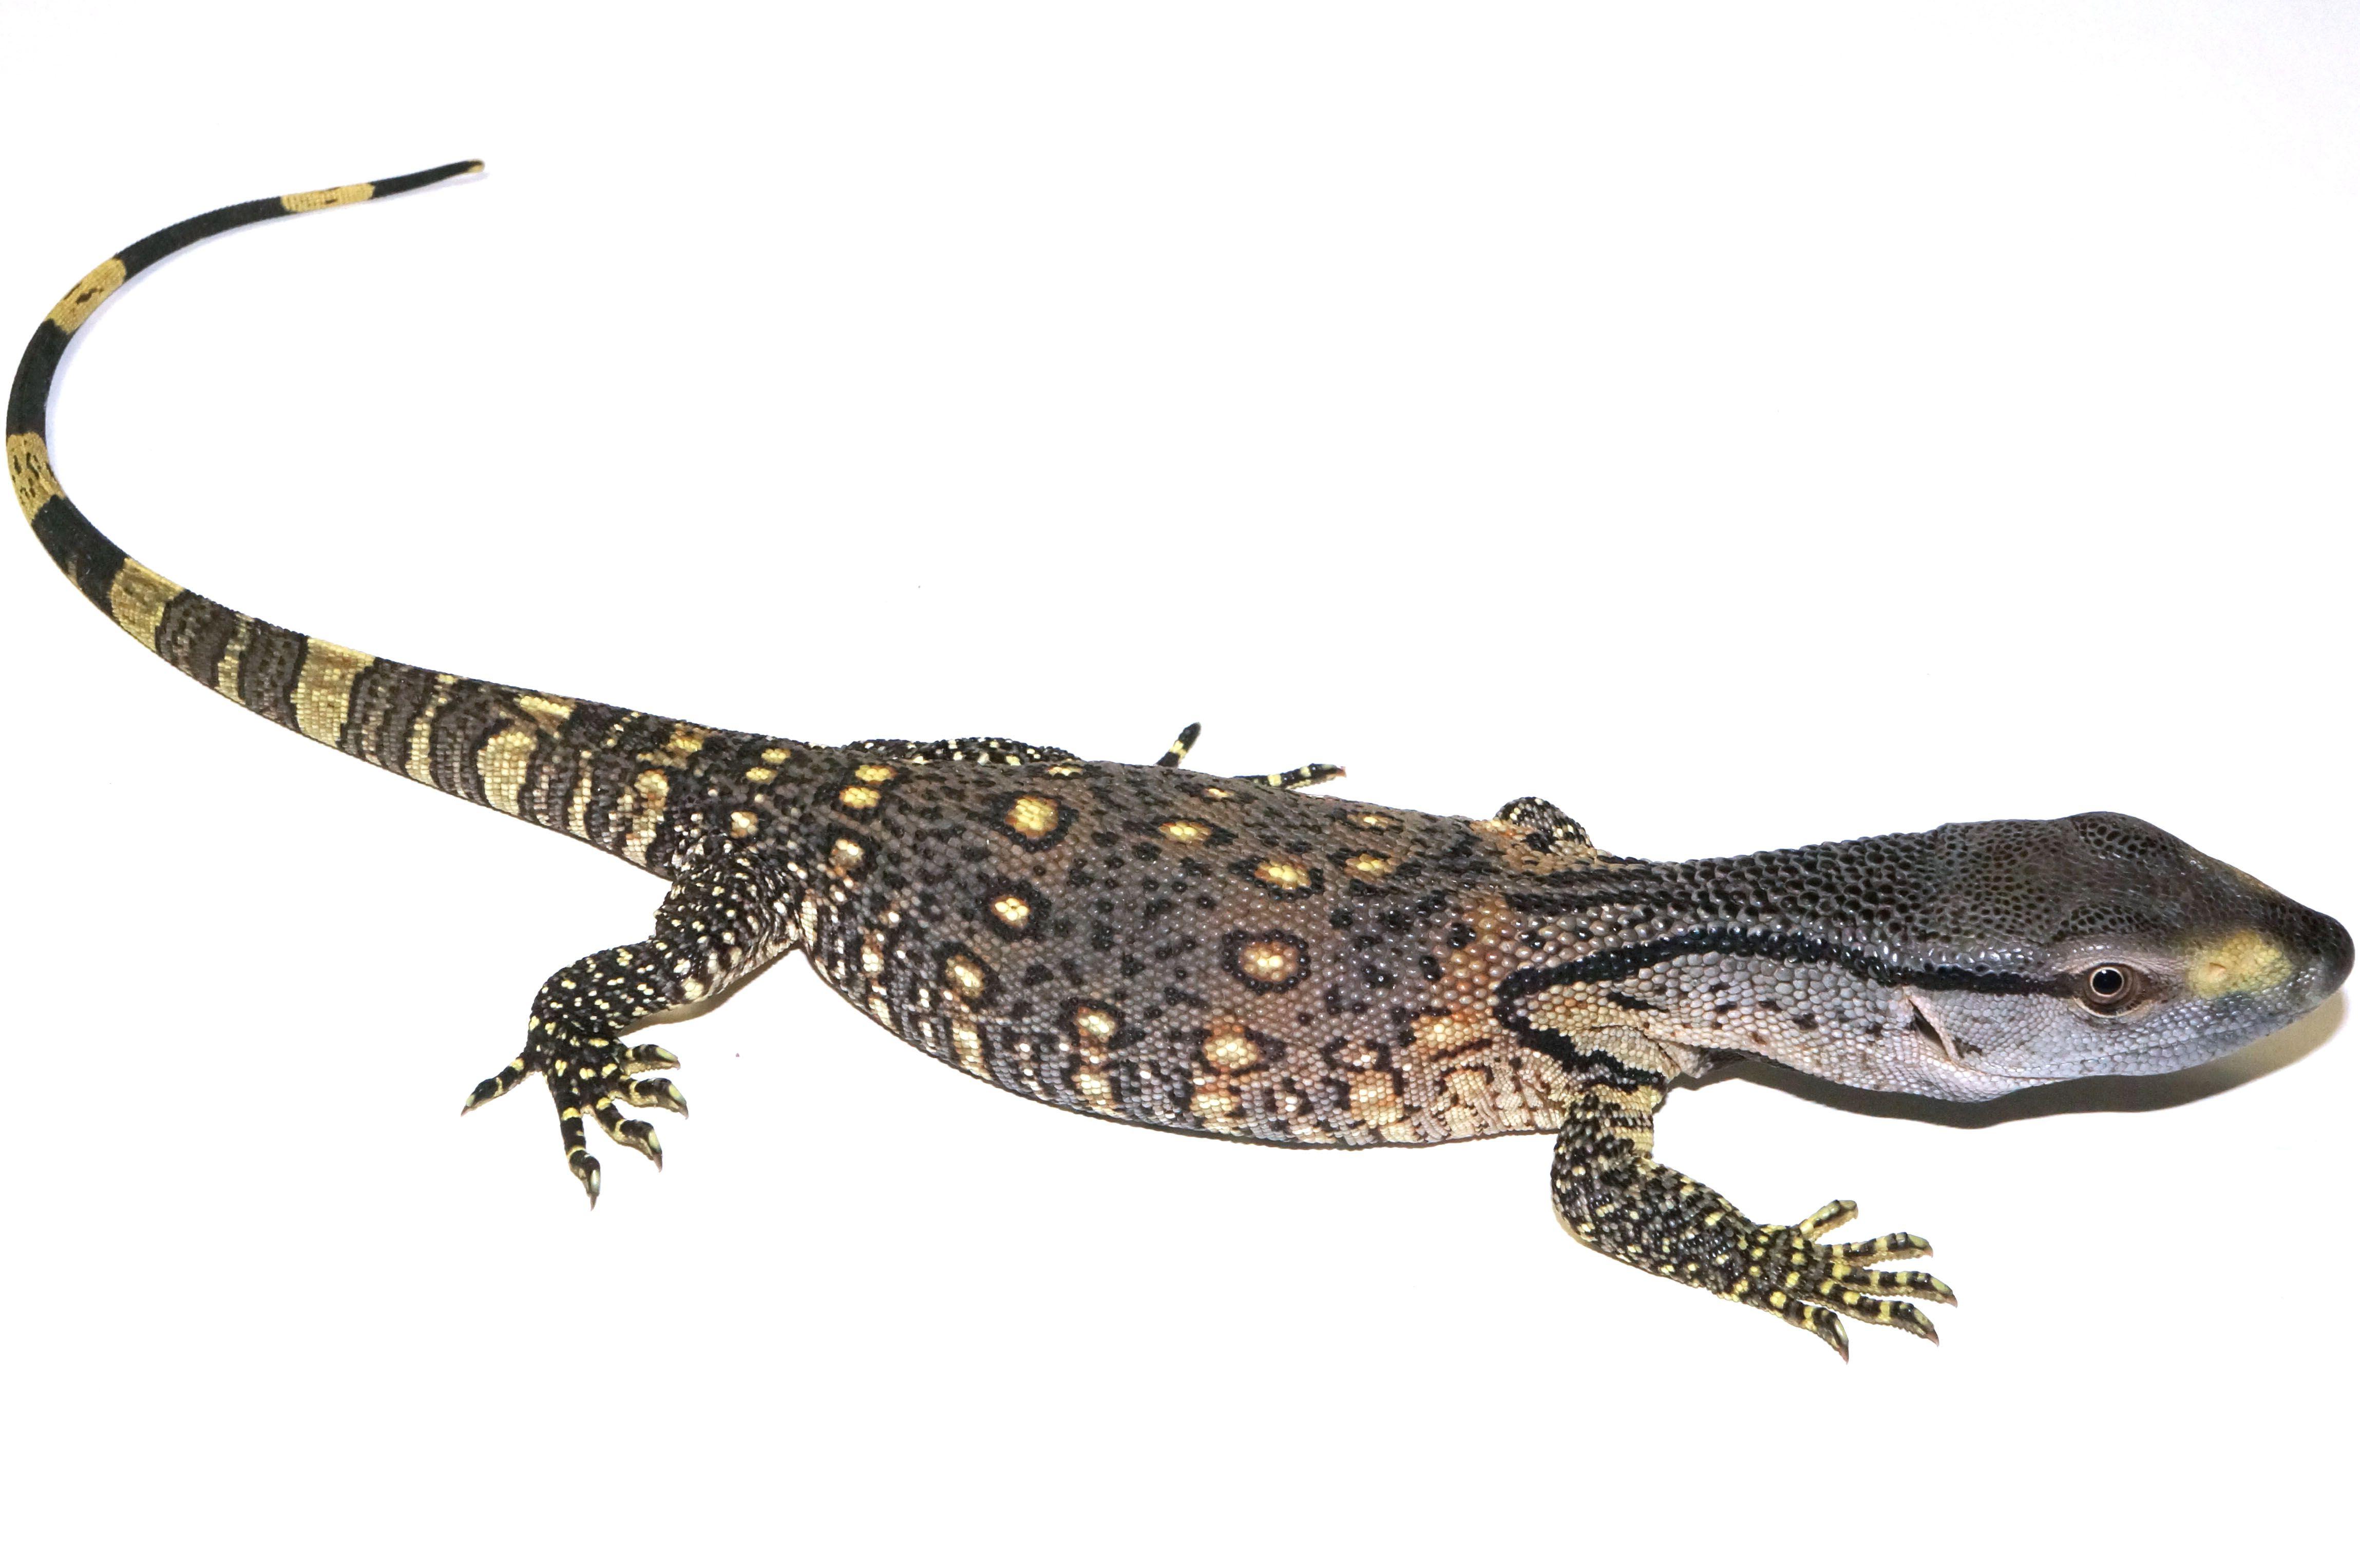 Baby Blackthroat Monitor | Lizards: Monitors & Tegus